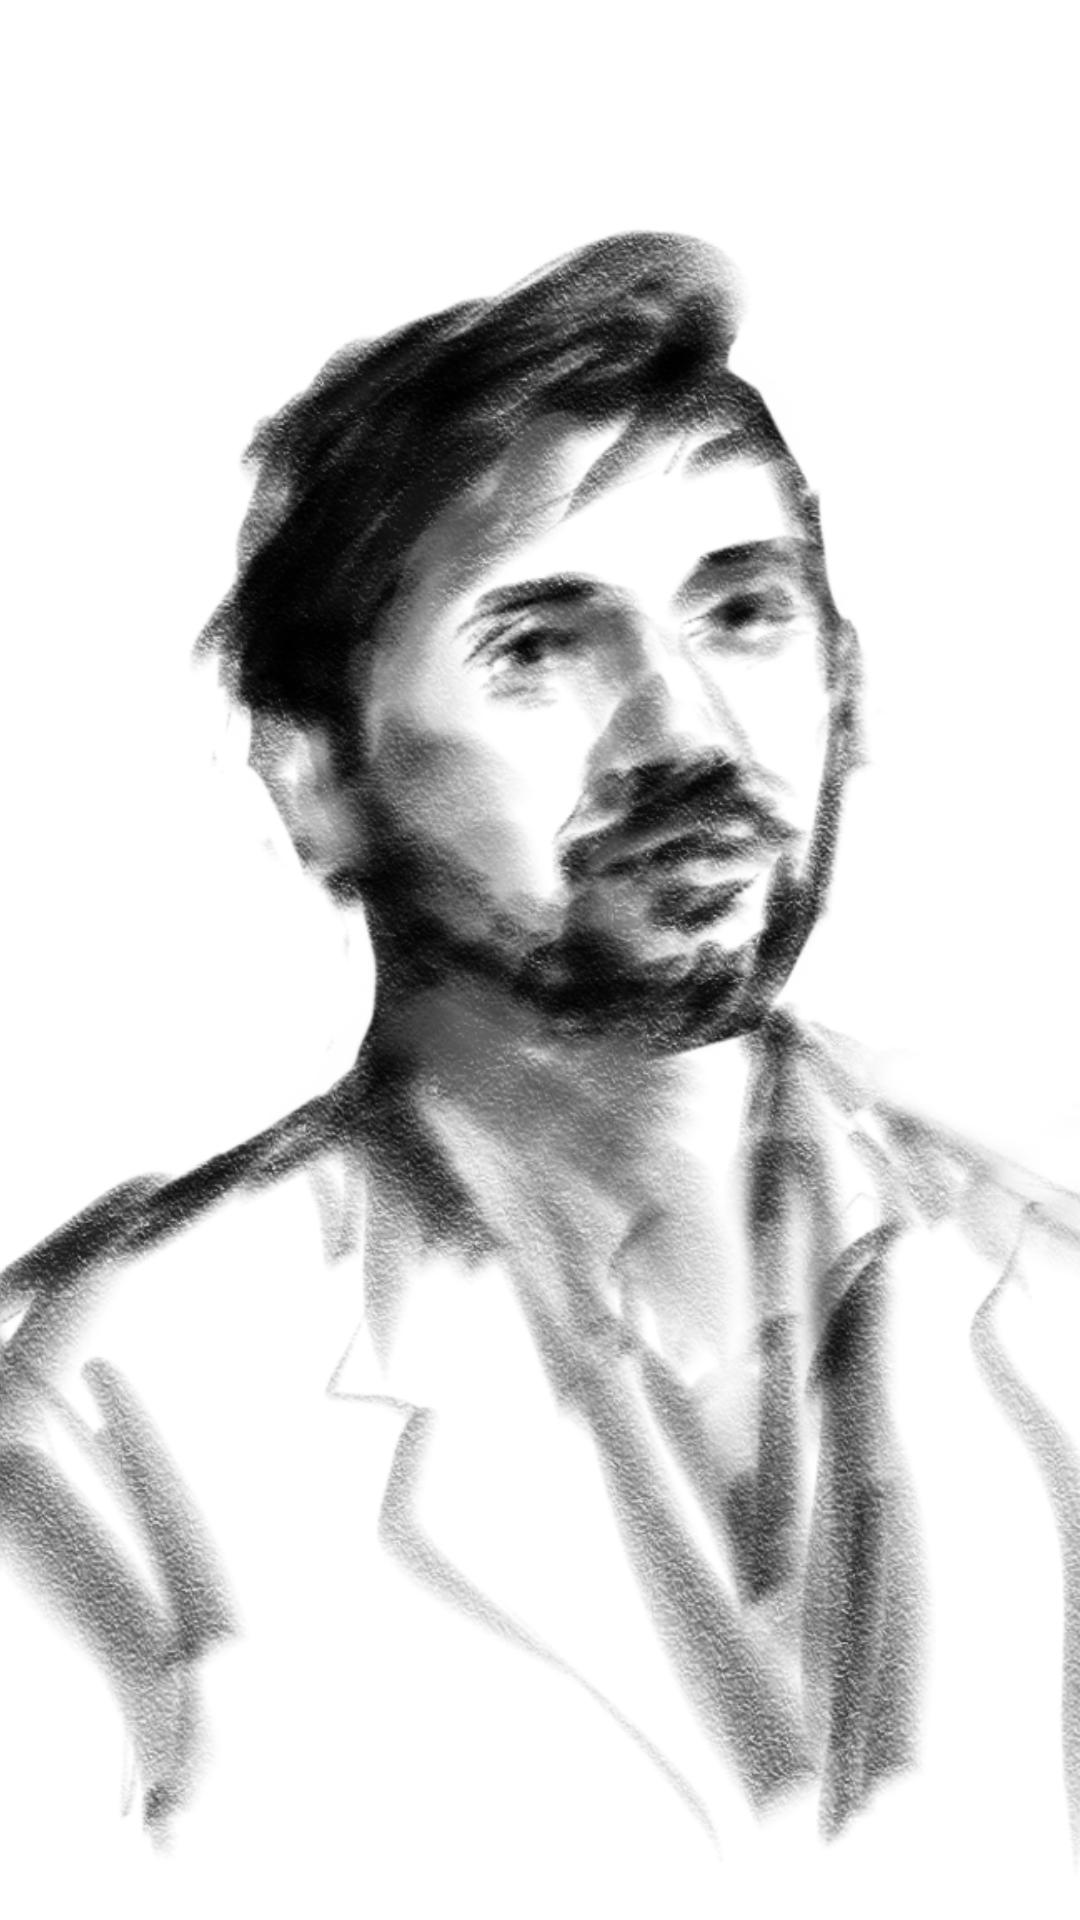 A custom portrait by artist Sean Devare